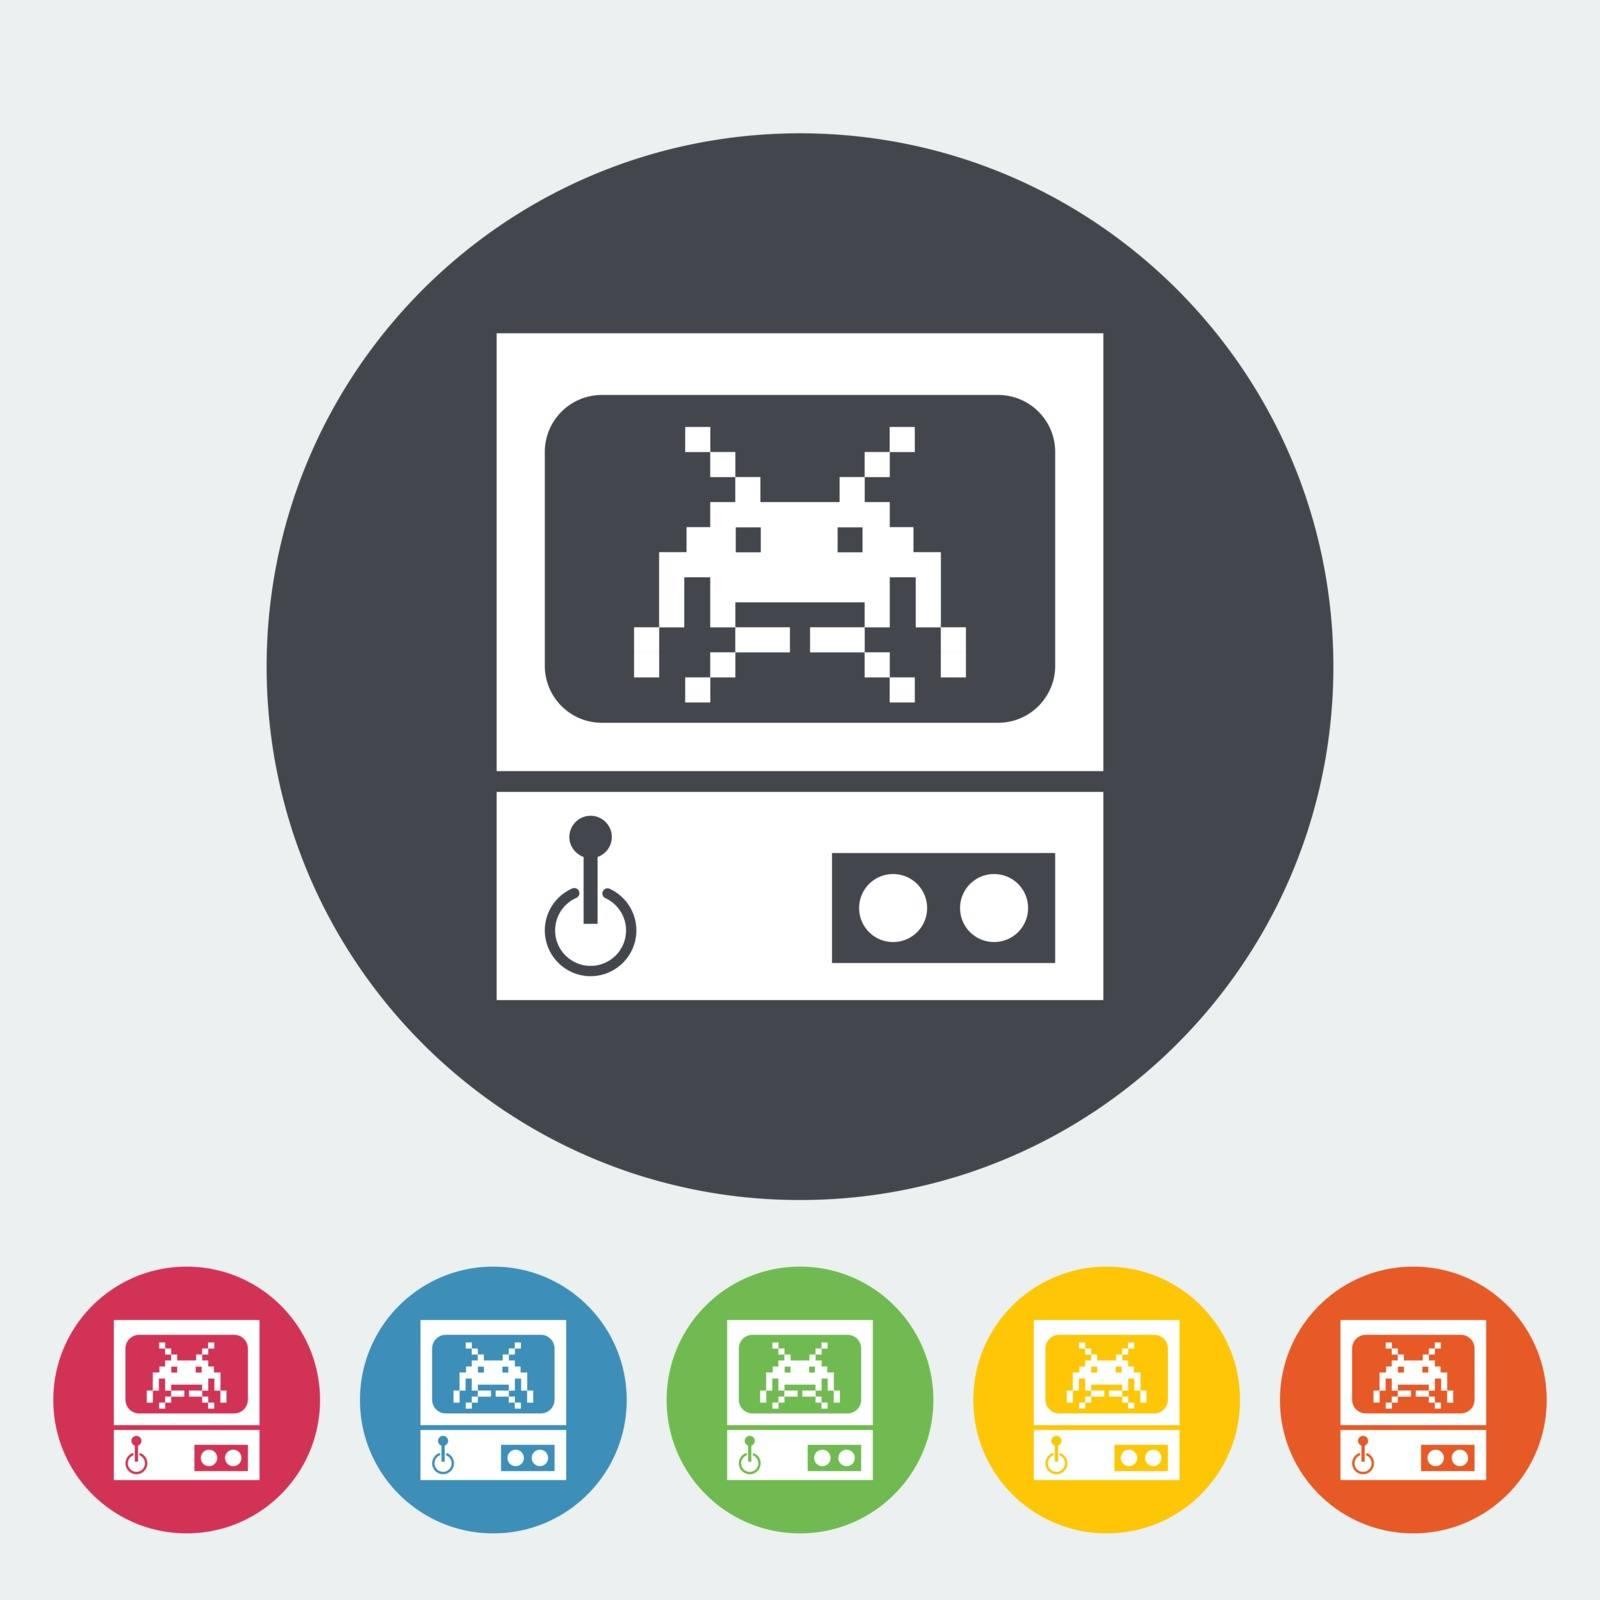 Retro Arcade Machine. Single flat icon on the circle button. Vector illustration.